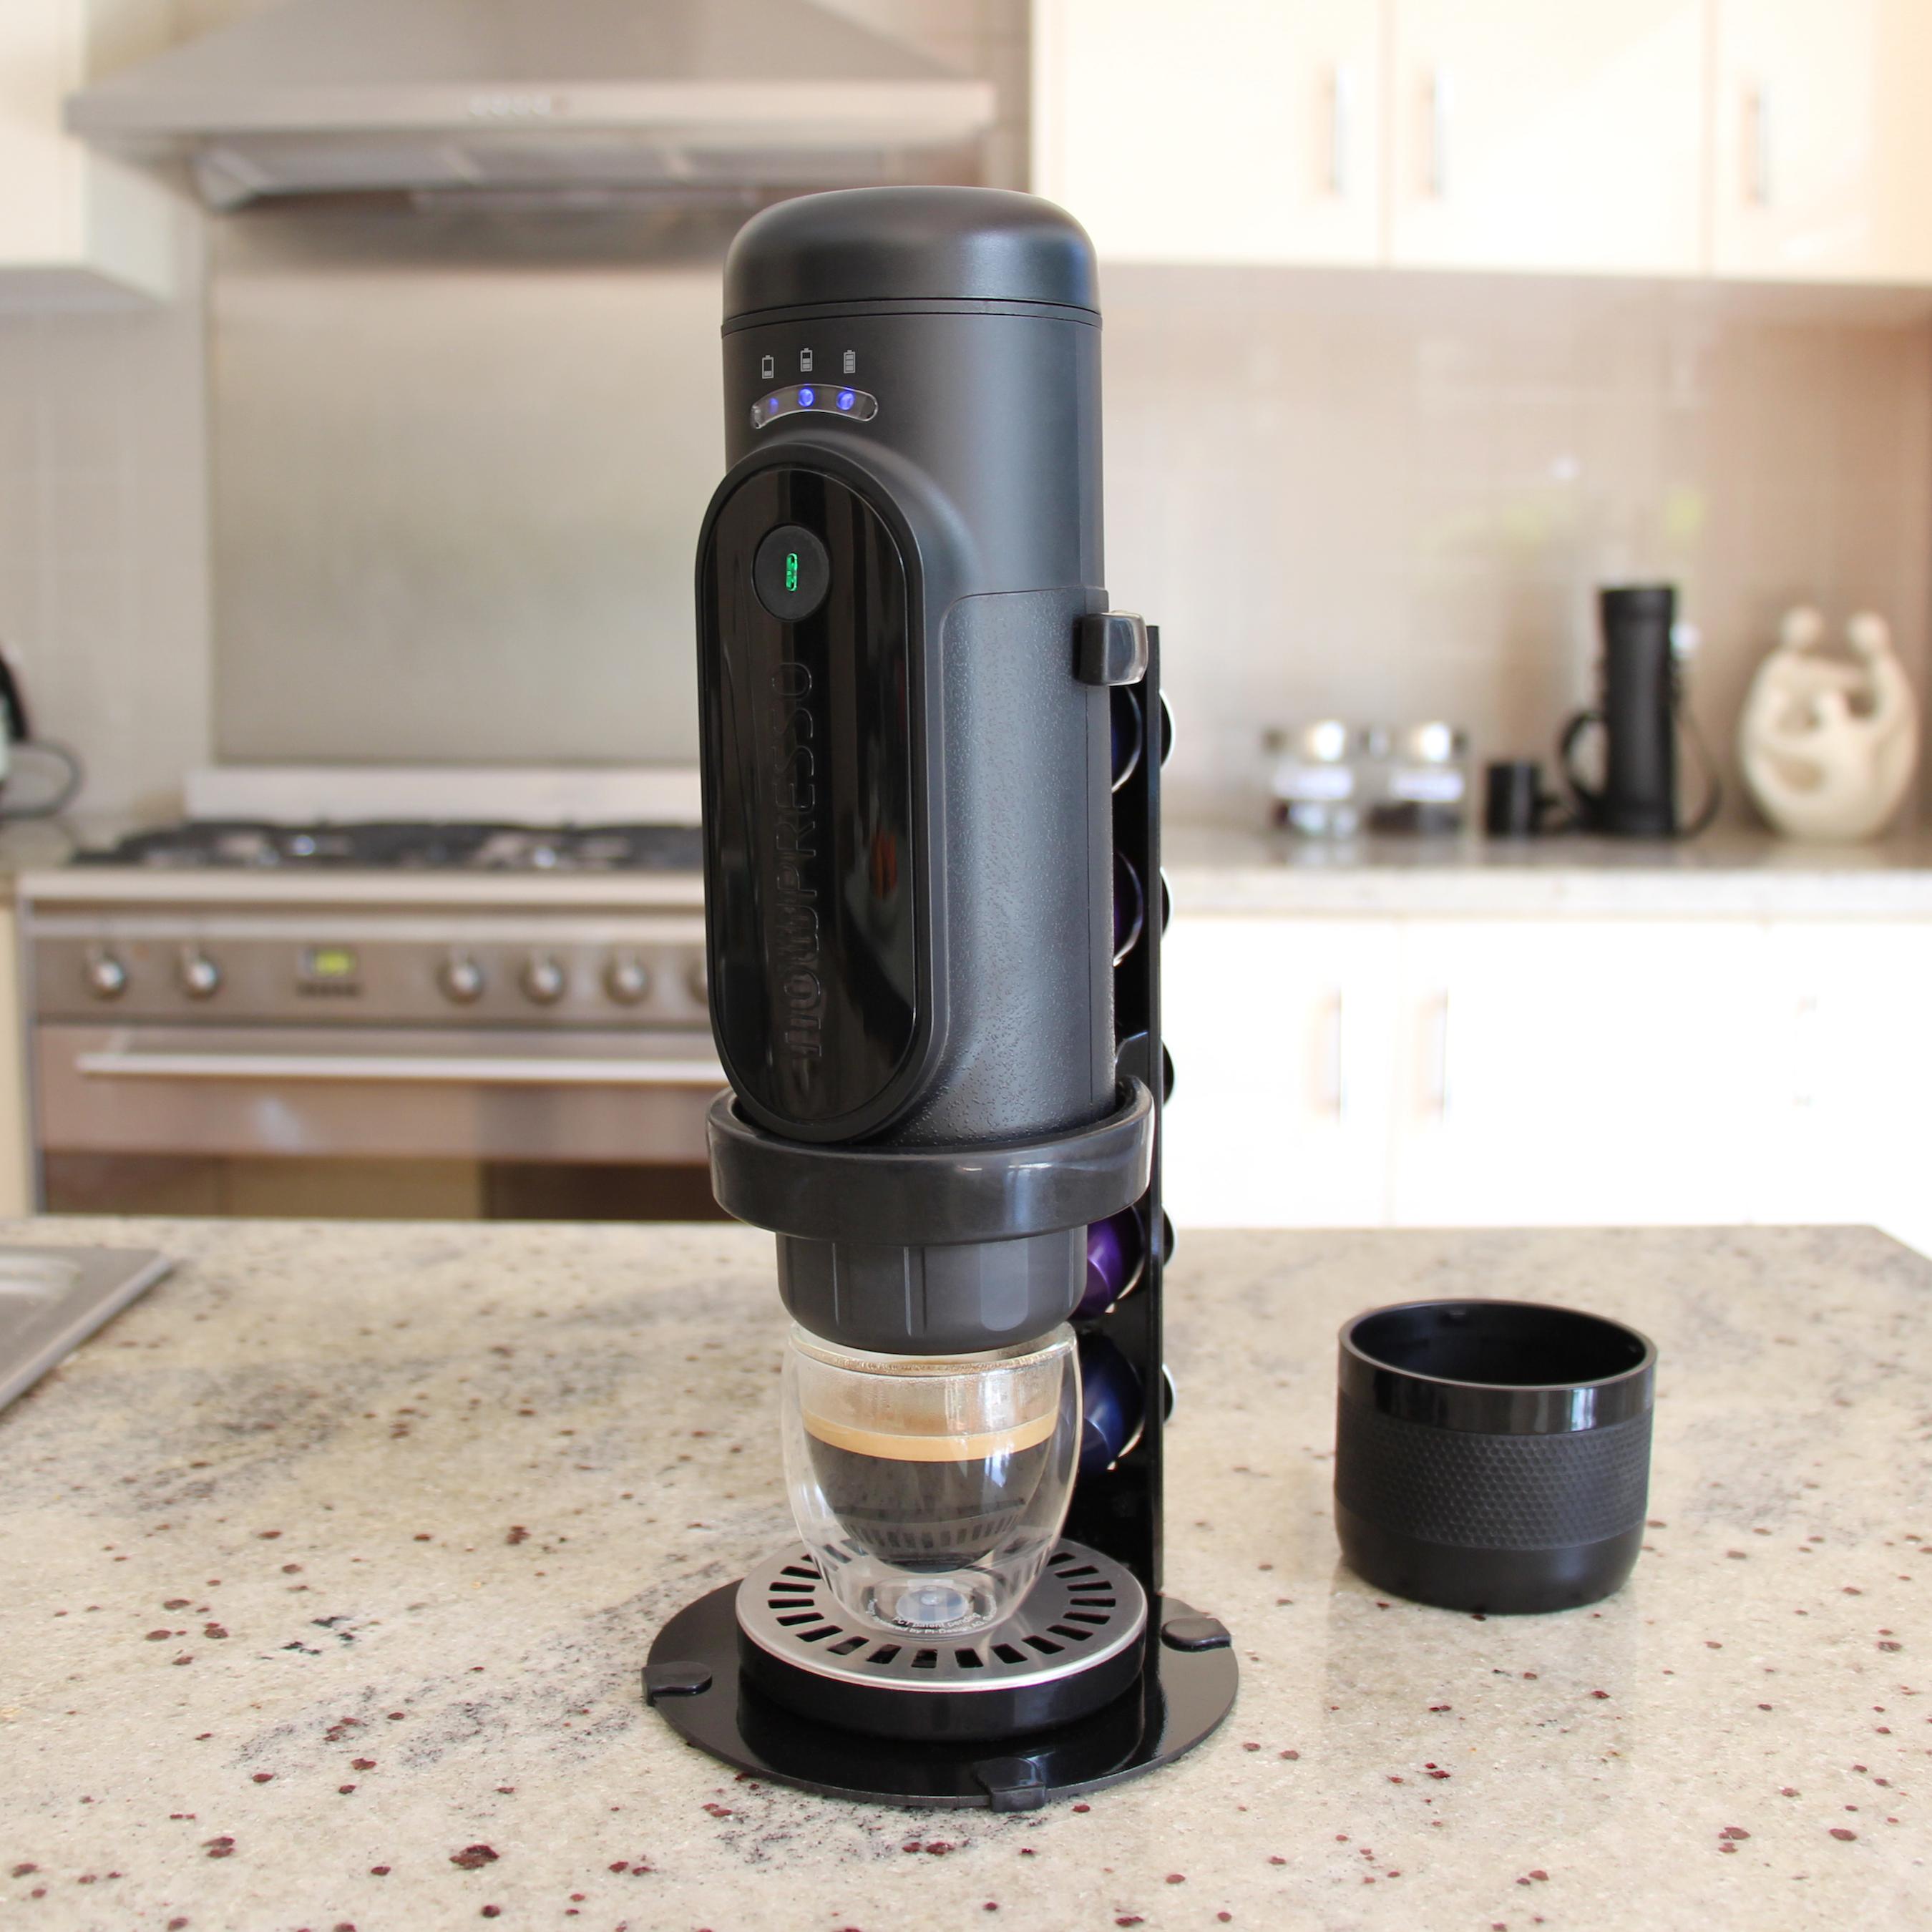 NowPresso Portable Espresso Machine Stand allows you to